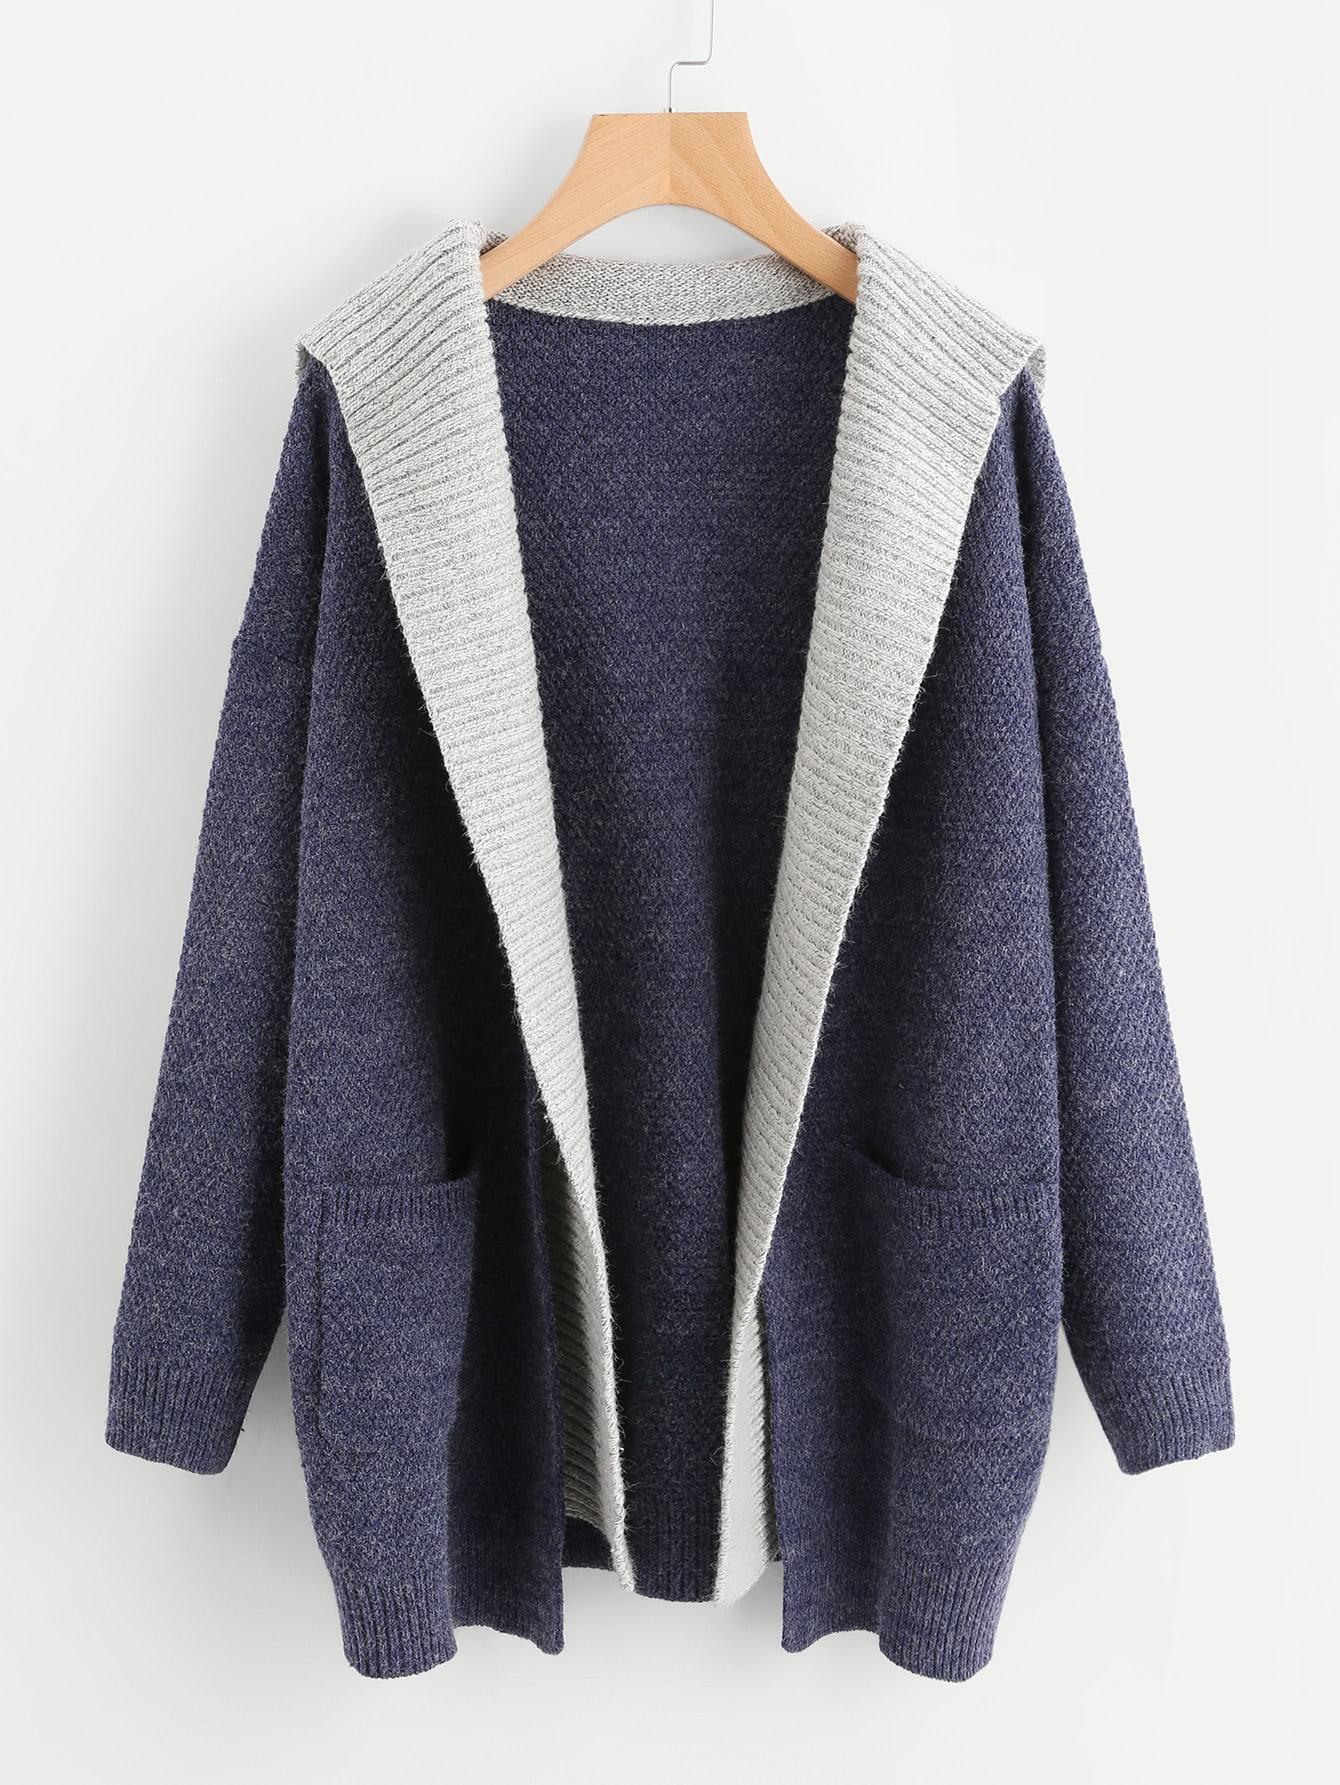 Contrast Hood Pocket Detail Open Front Sweater Coat sweater170804461